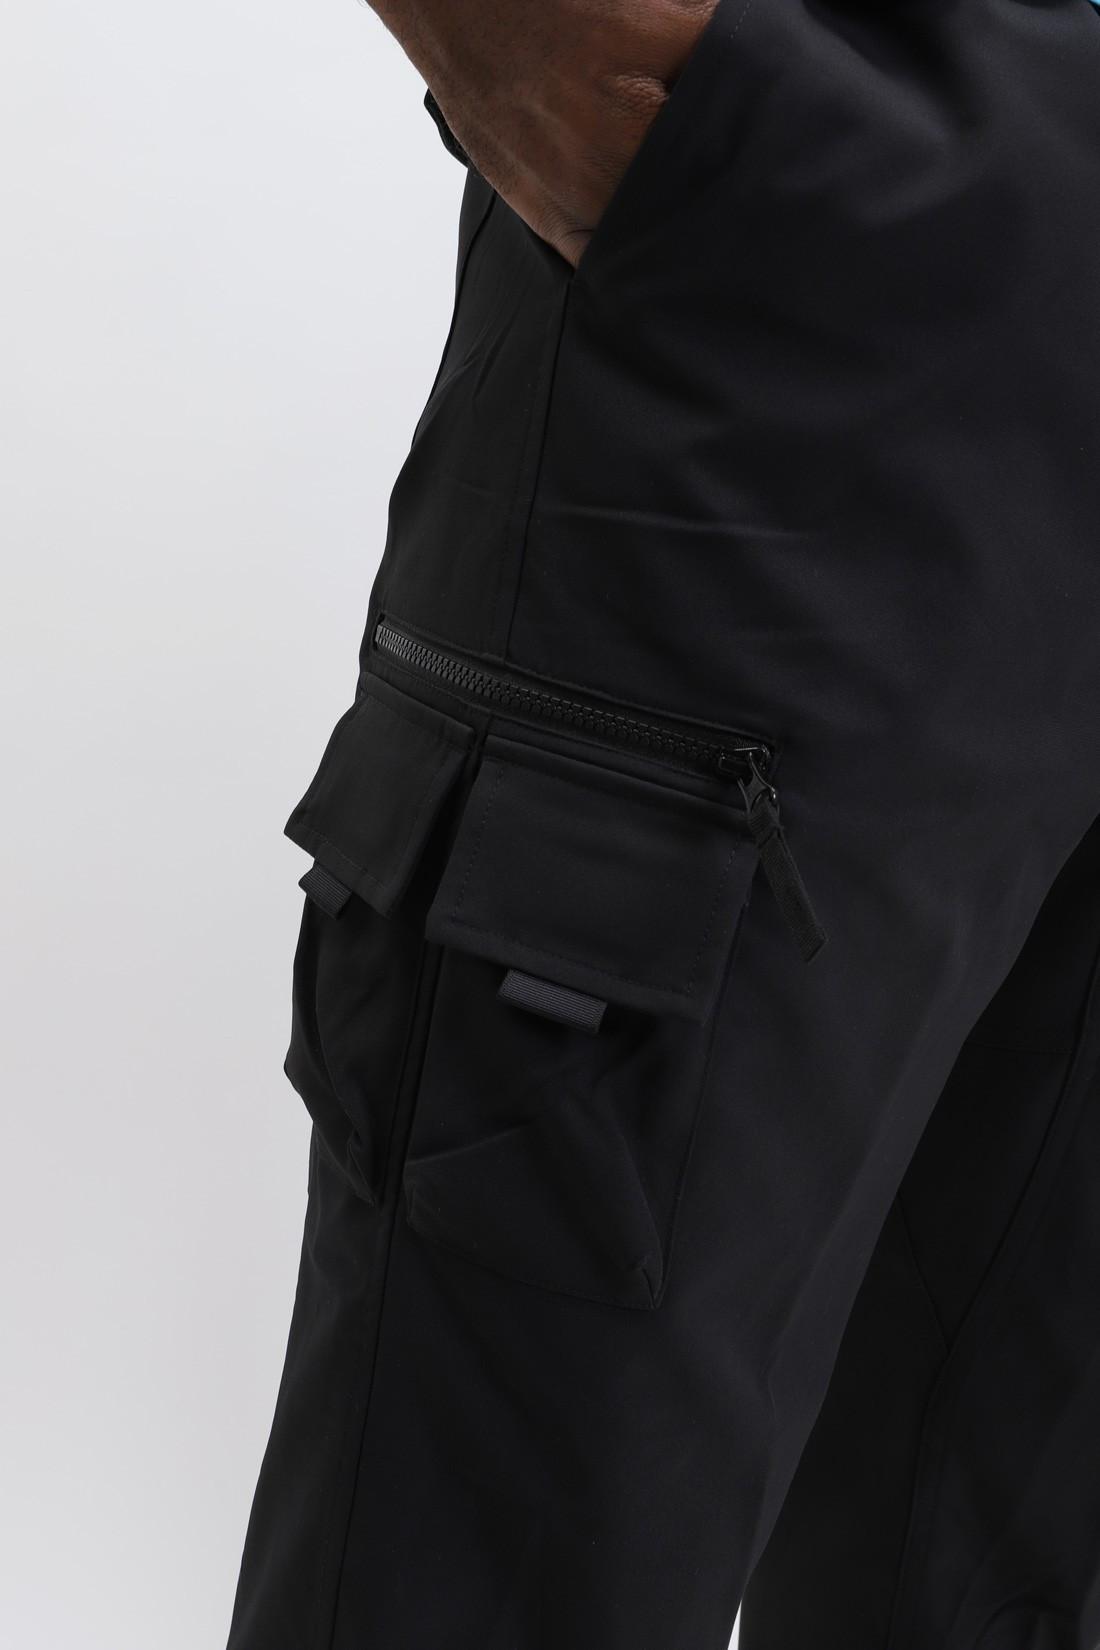 CARHARTT WIP / Elmwood pant Black